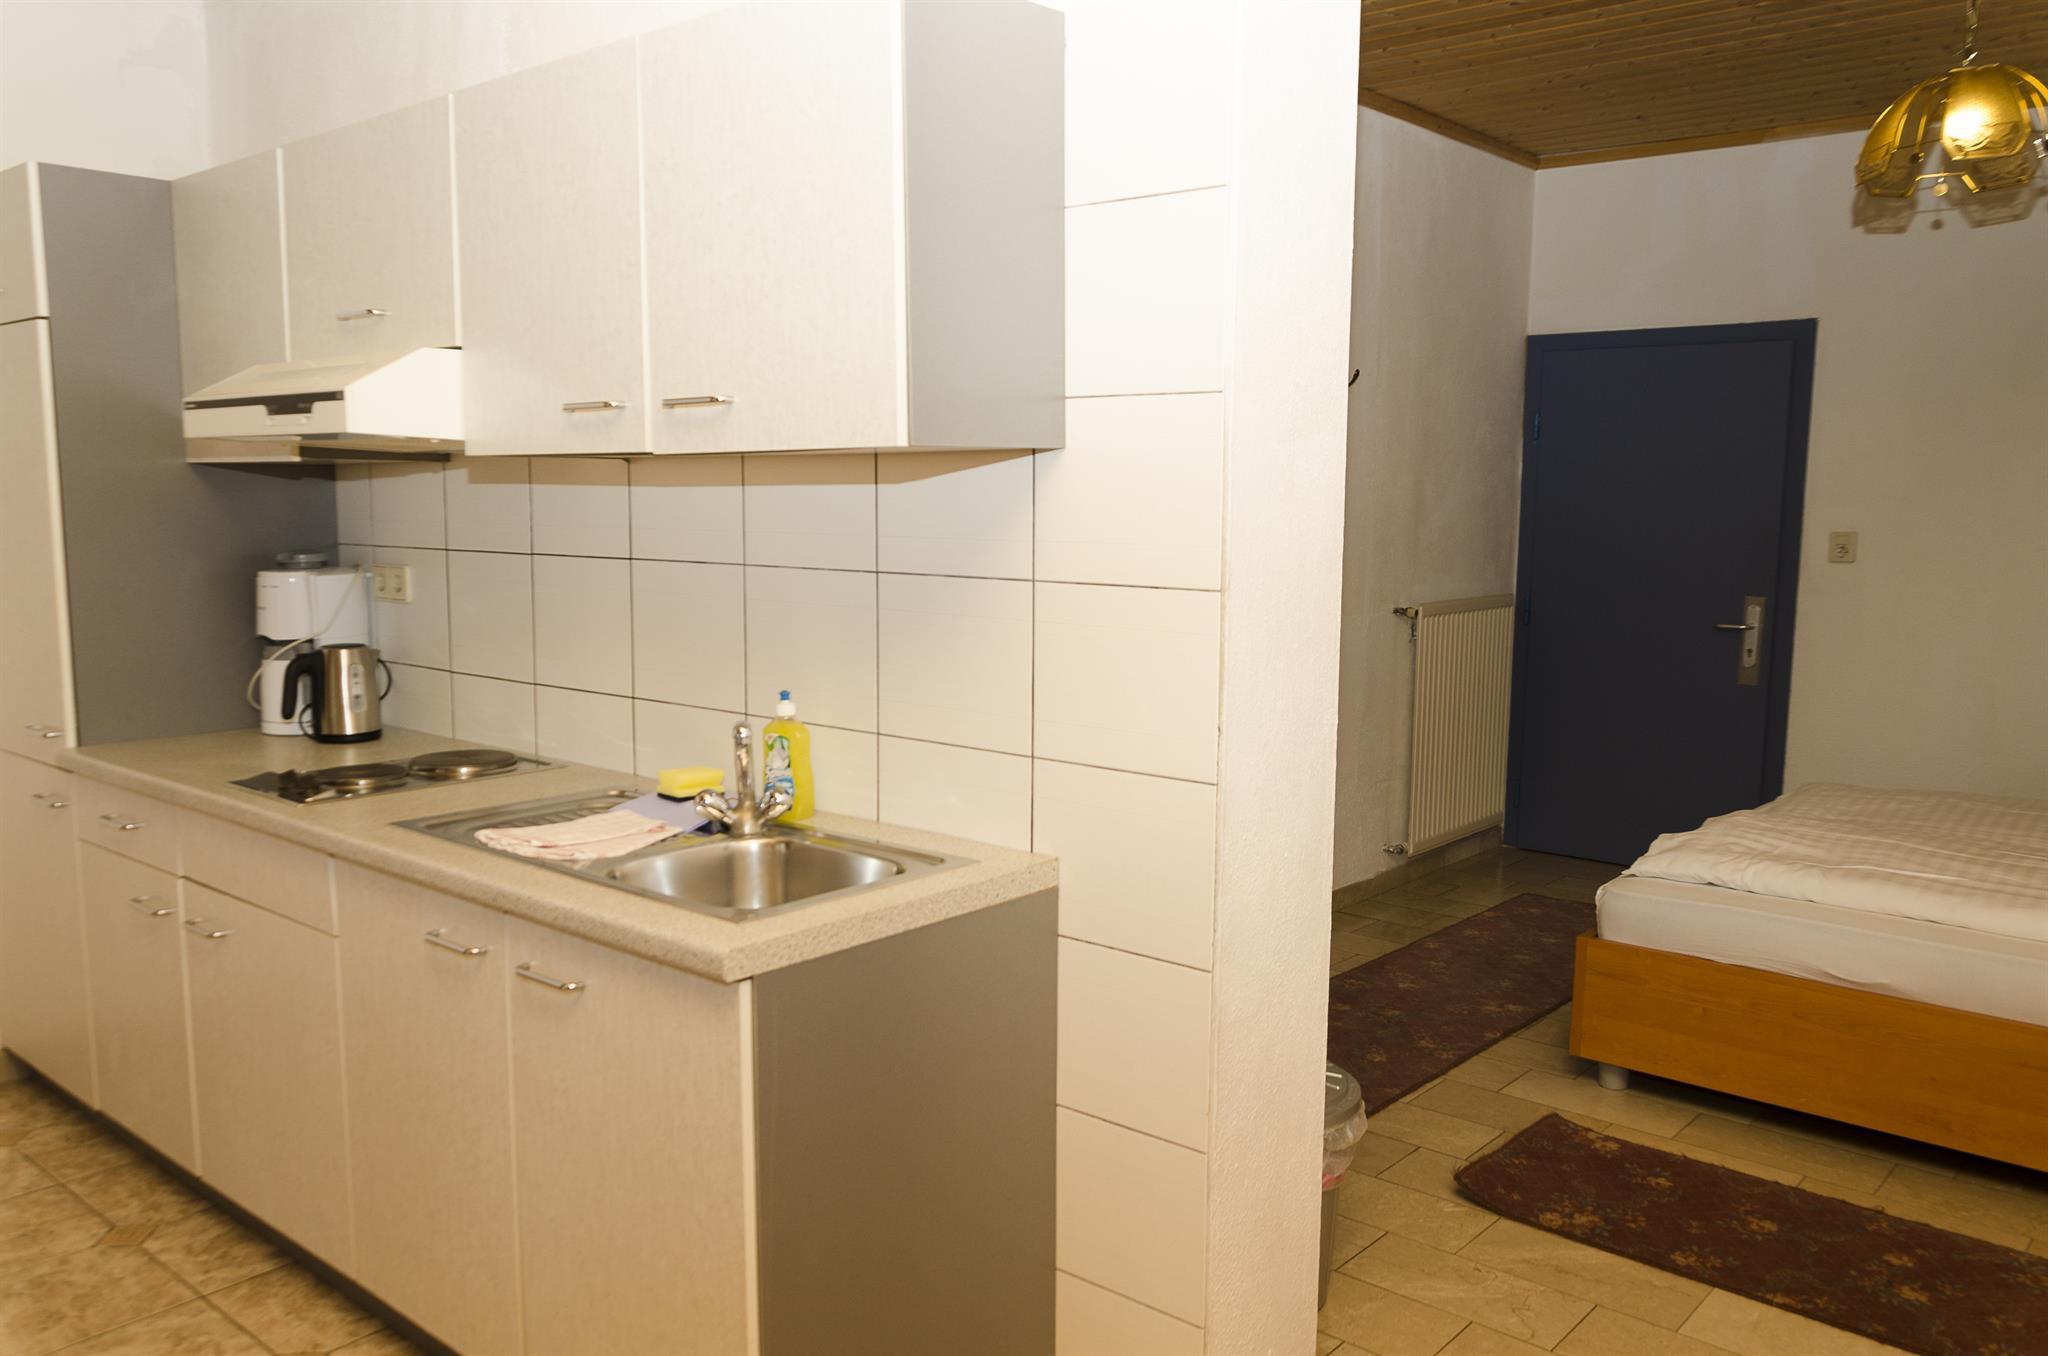 Holiday apartment Rosenhof Appartementhaus Appartement 30m² (2008887), Podersdorf am See, Lake Neusiedl, Burgenland, Austria, picture 12